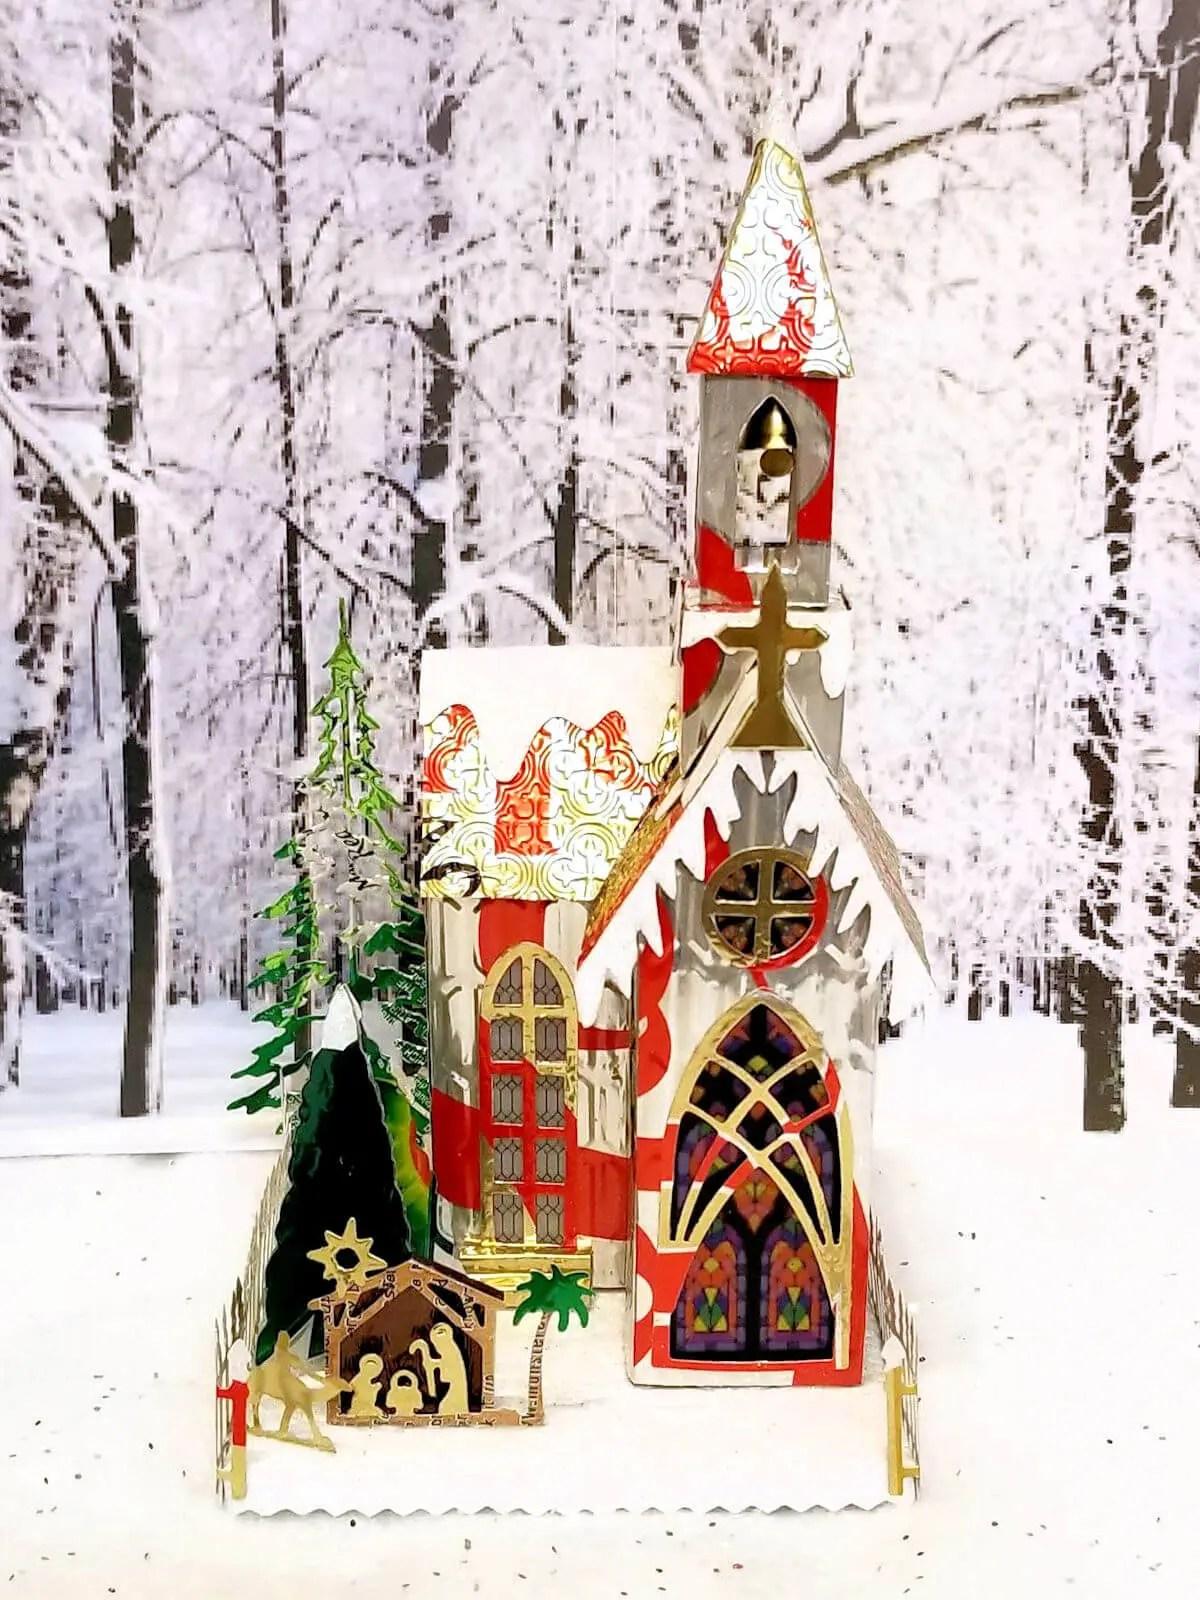 Winter Village Church #2 aluminum can house